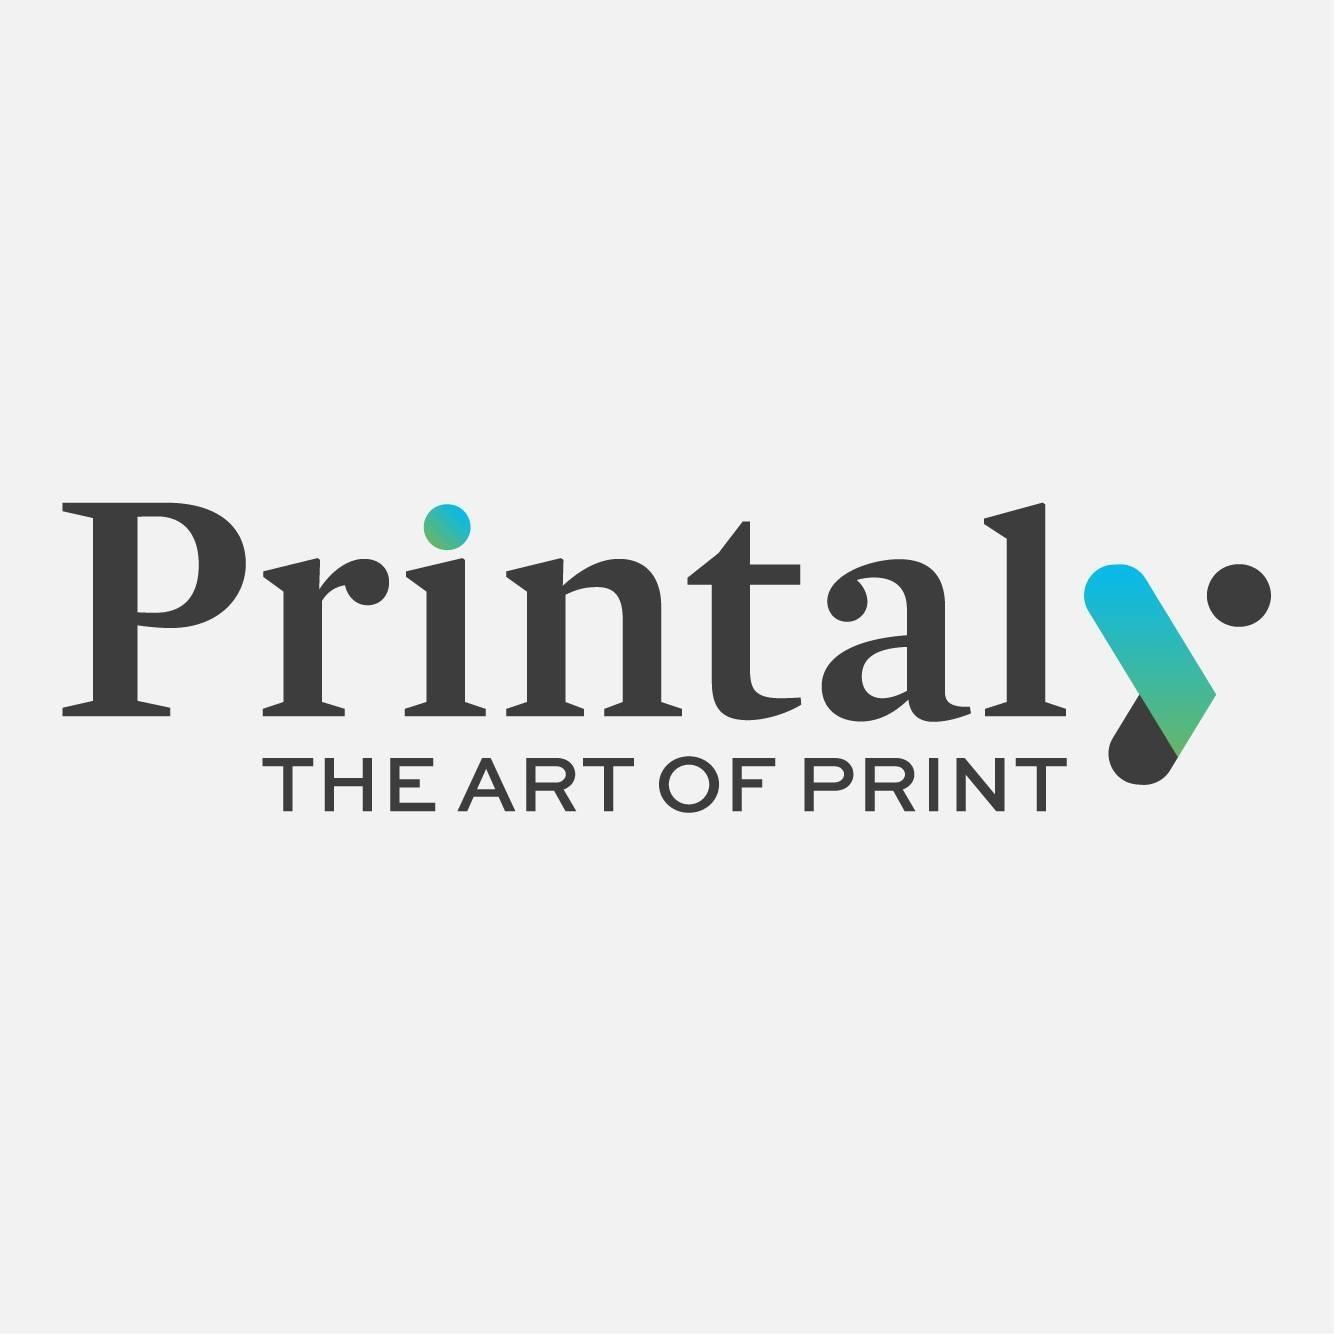 Printaly